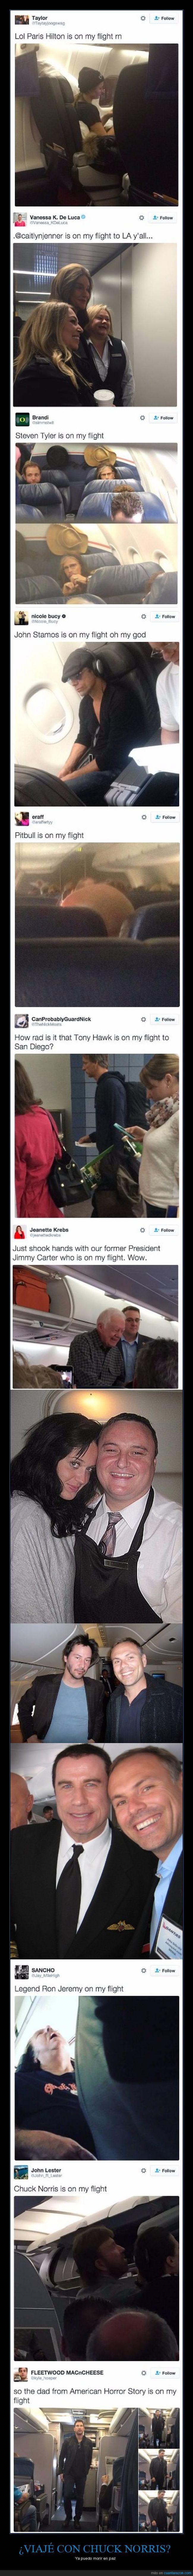 avion,famosos,volar